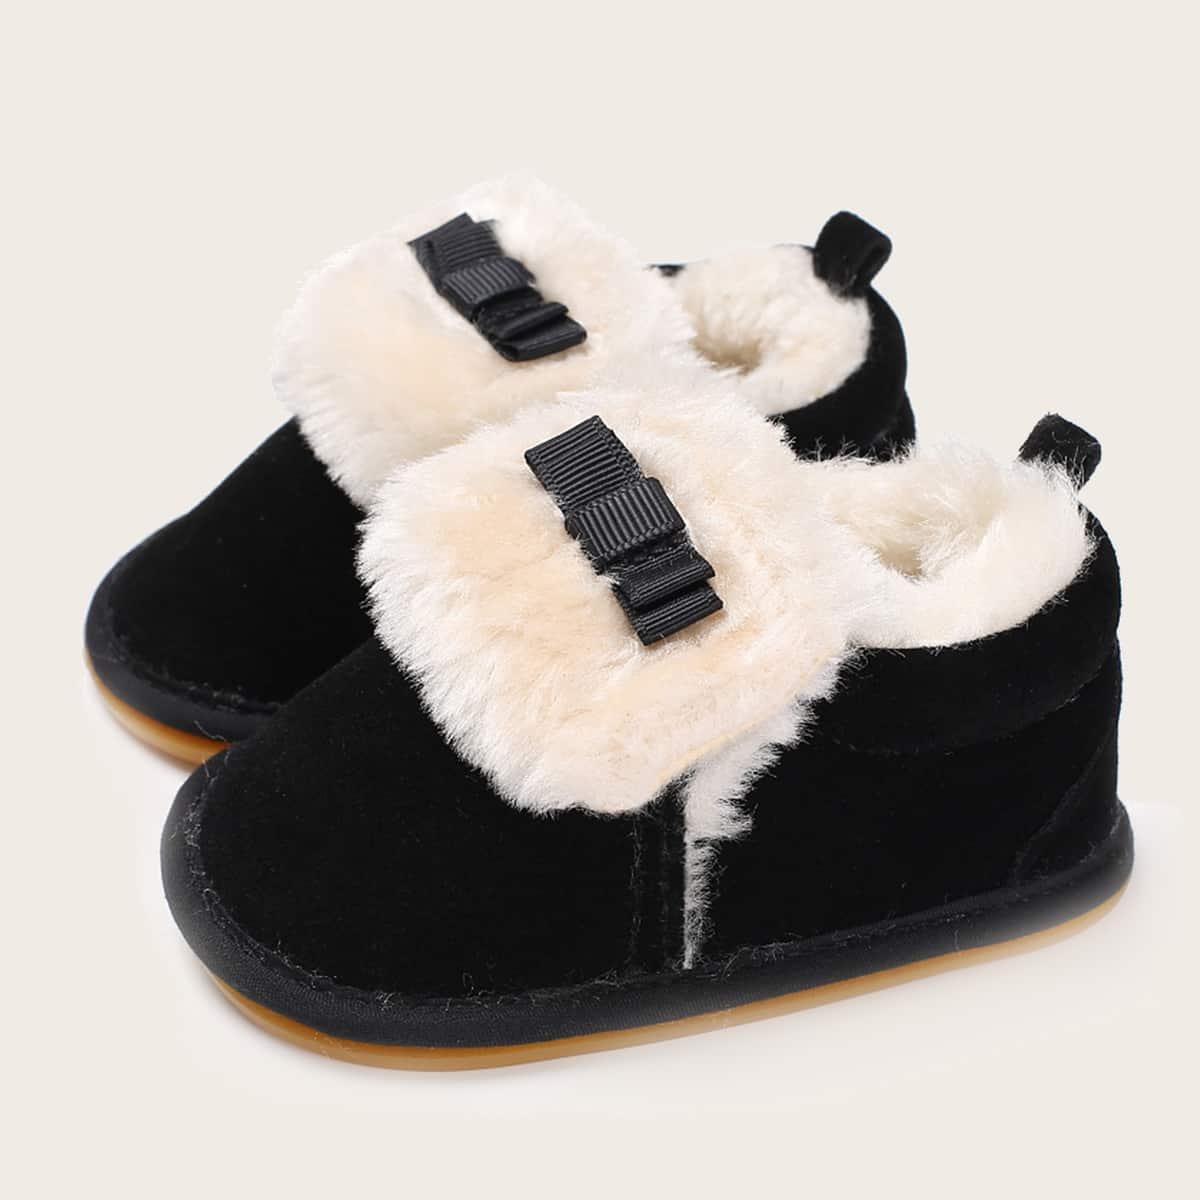 shein Baby Girl Bow Decor Snowboots